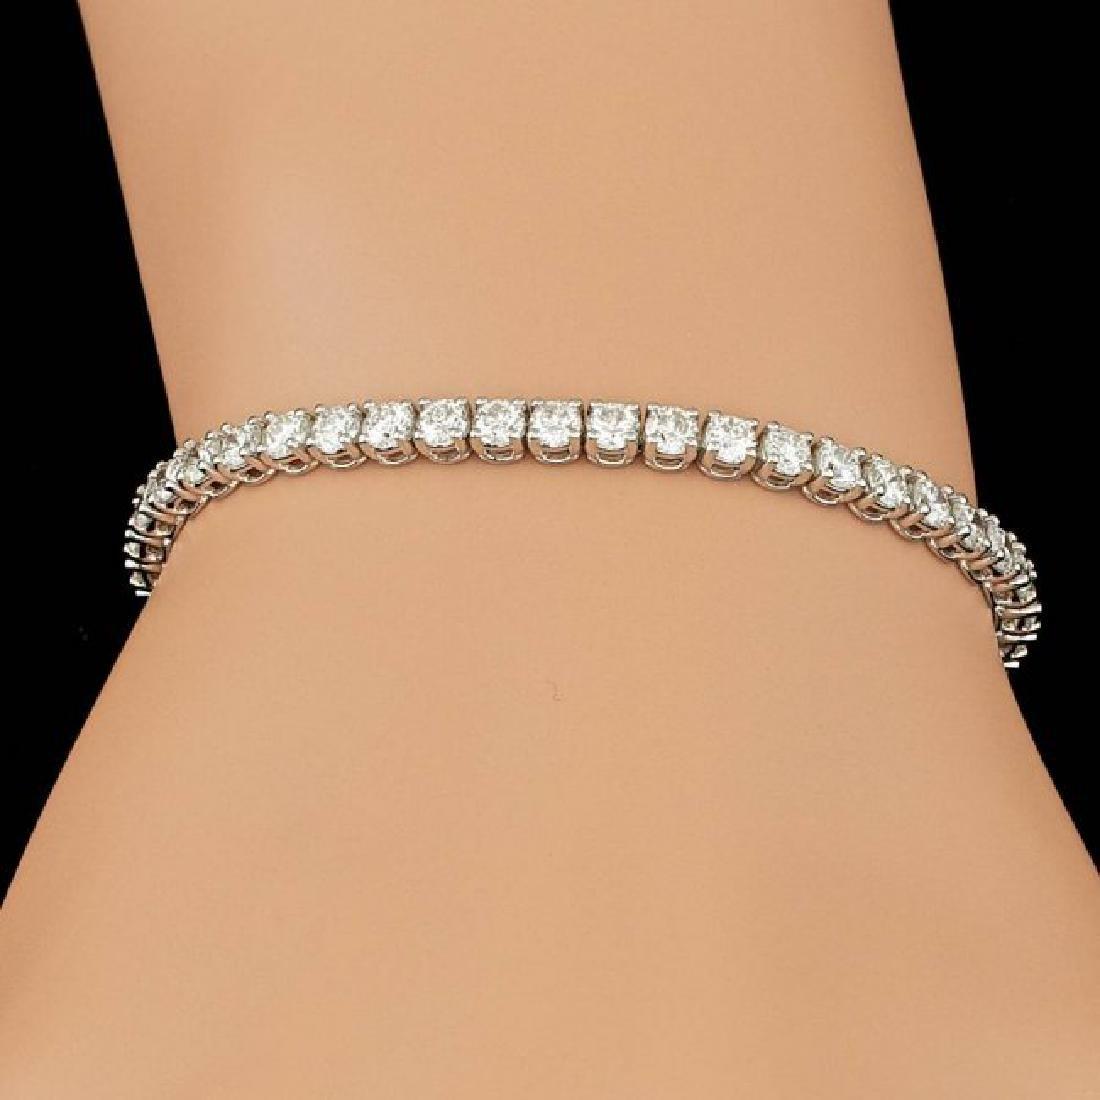 18k White Gold 6.55ct Diamond Bracelet - 4